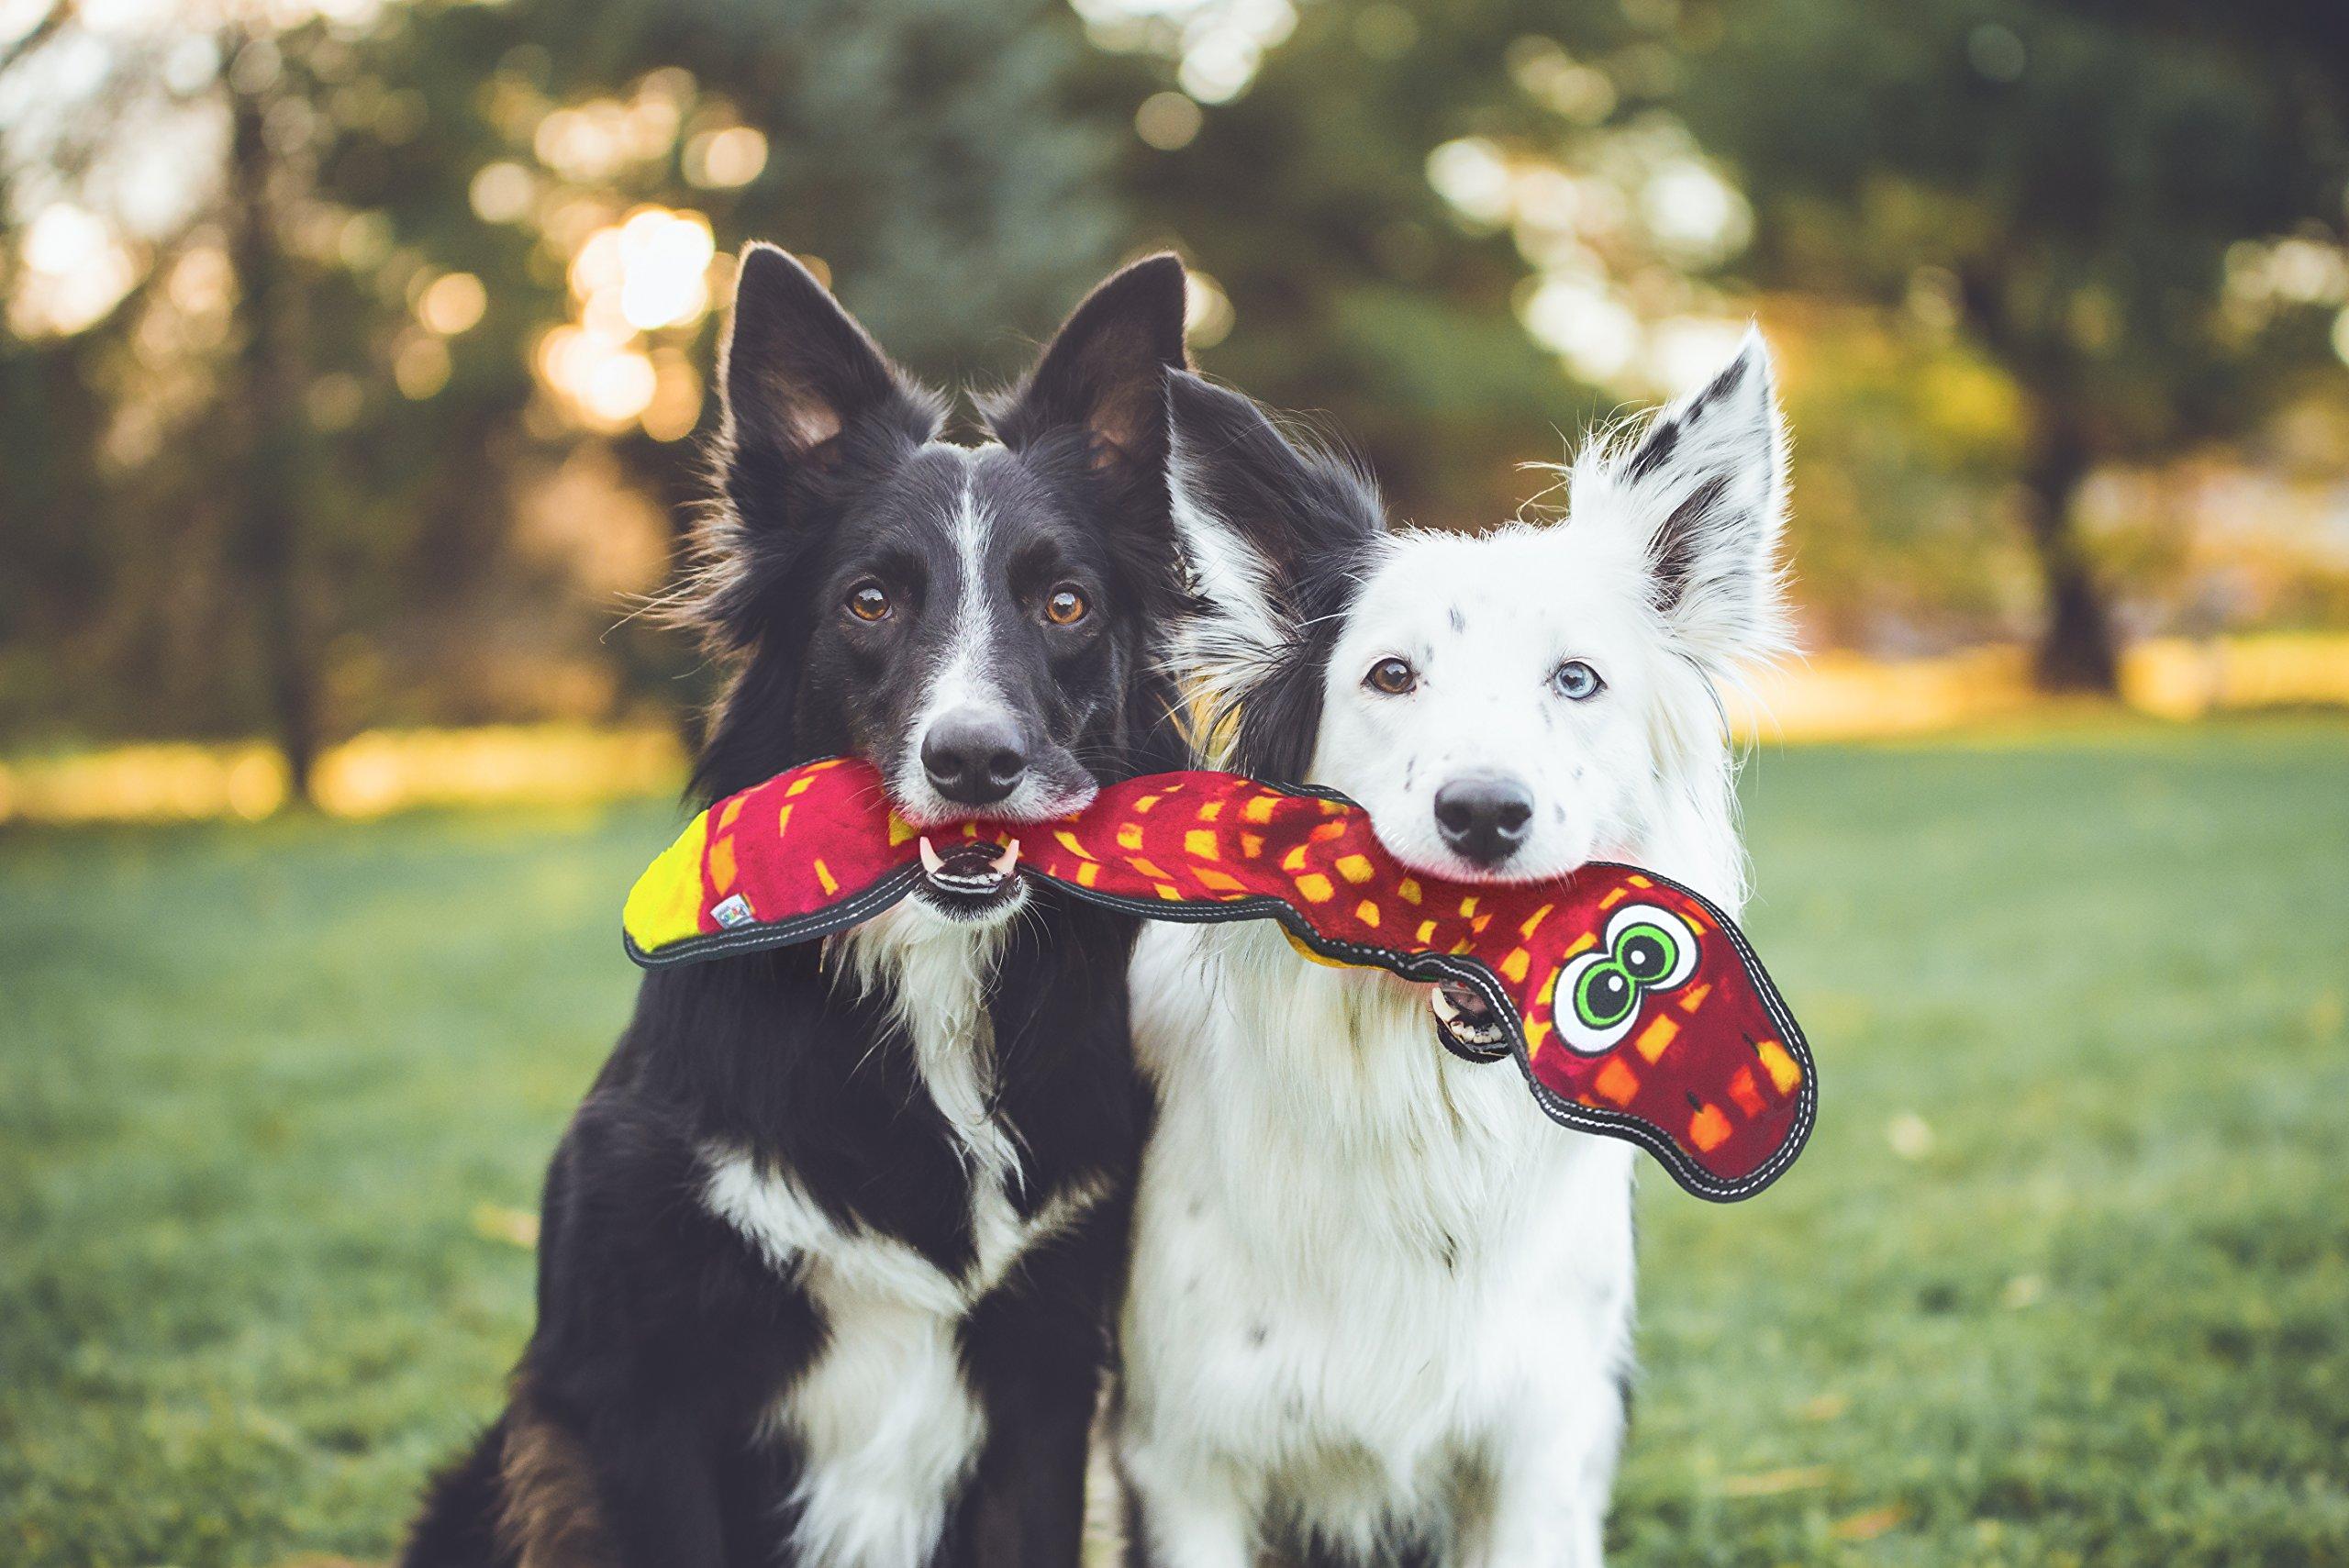 Outward Hound Invincibles Tough Seamz Stuffingless Durable Tough Plush Toy for Dogs, Tough Squeaky Dog Toy by, Snake, 3 Squeakers by Outward Hound (Image #4)